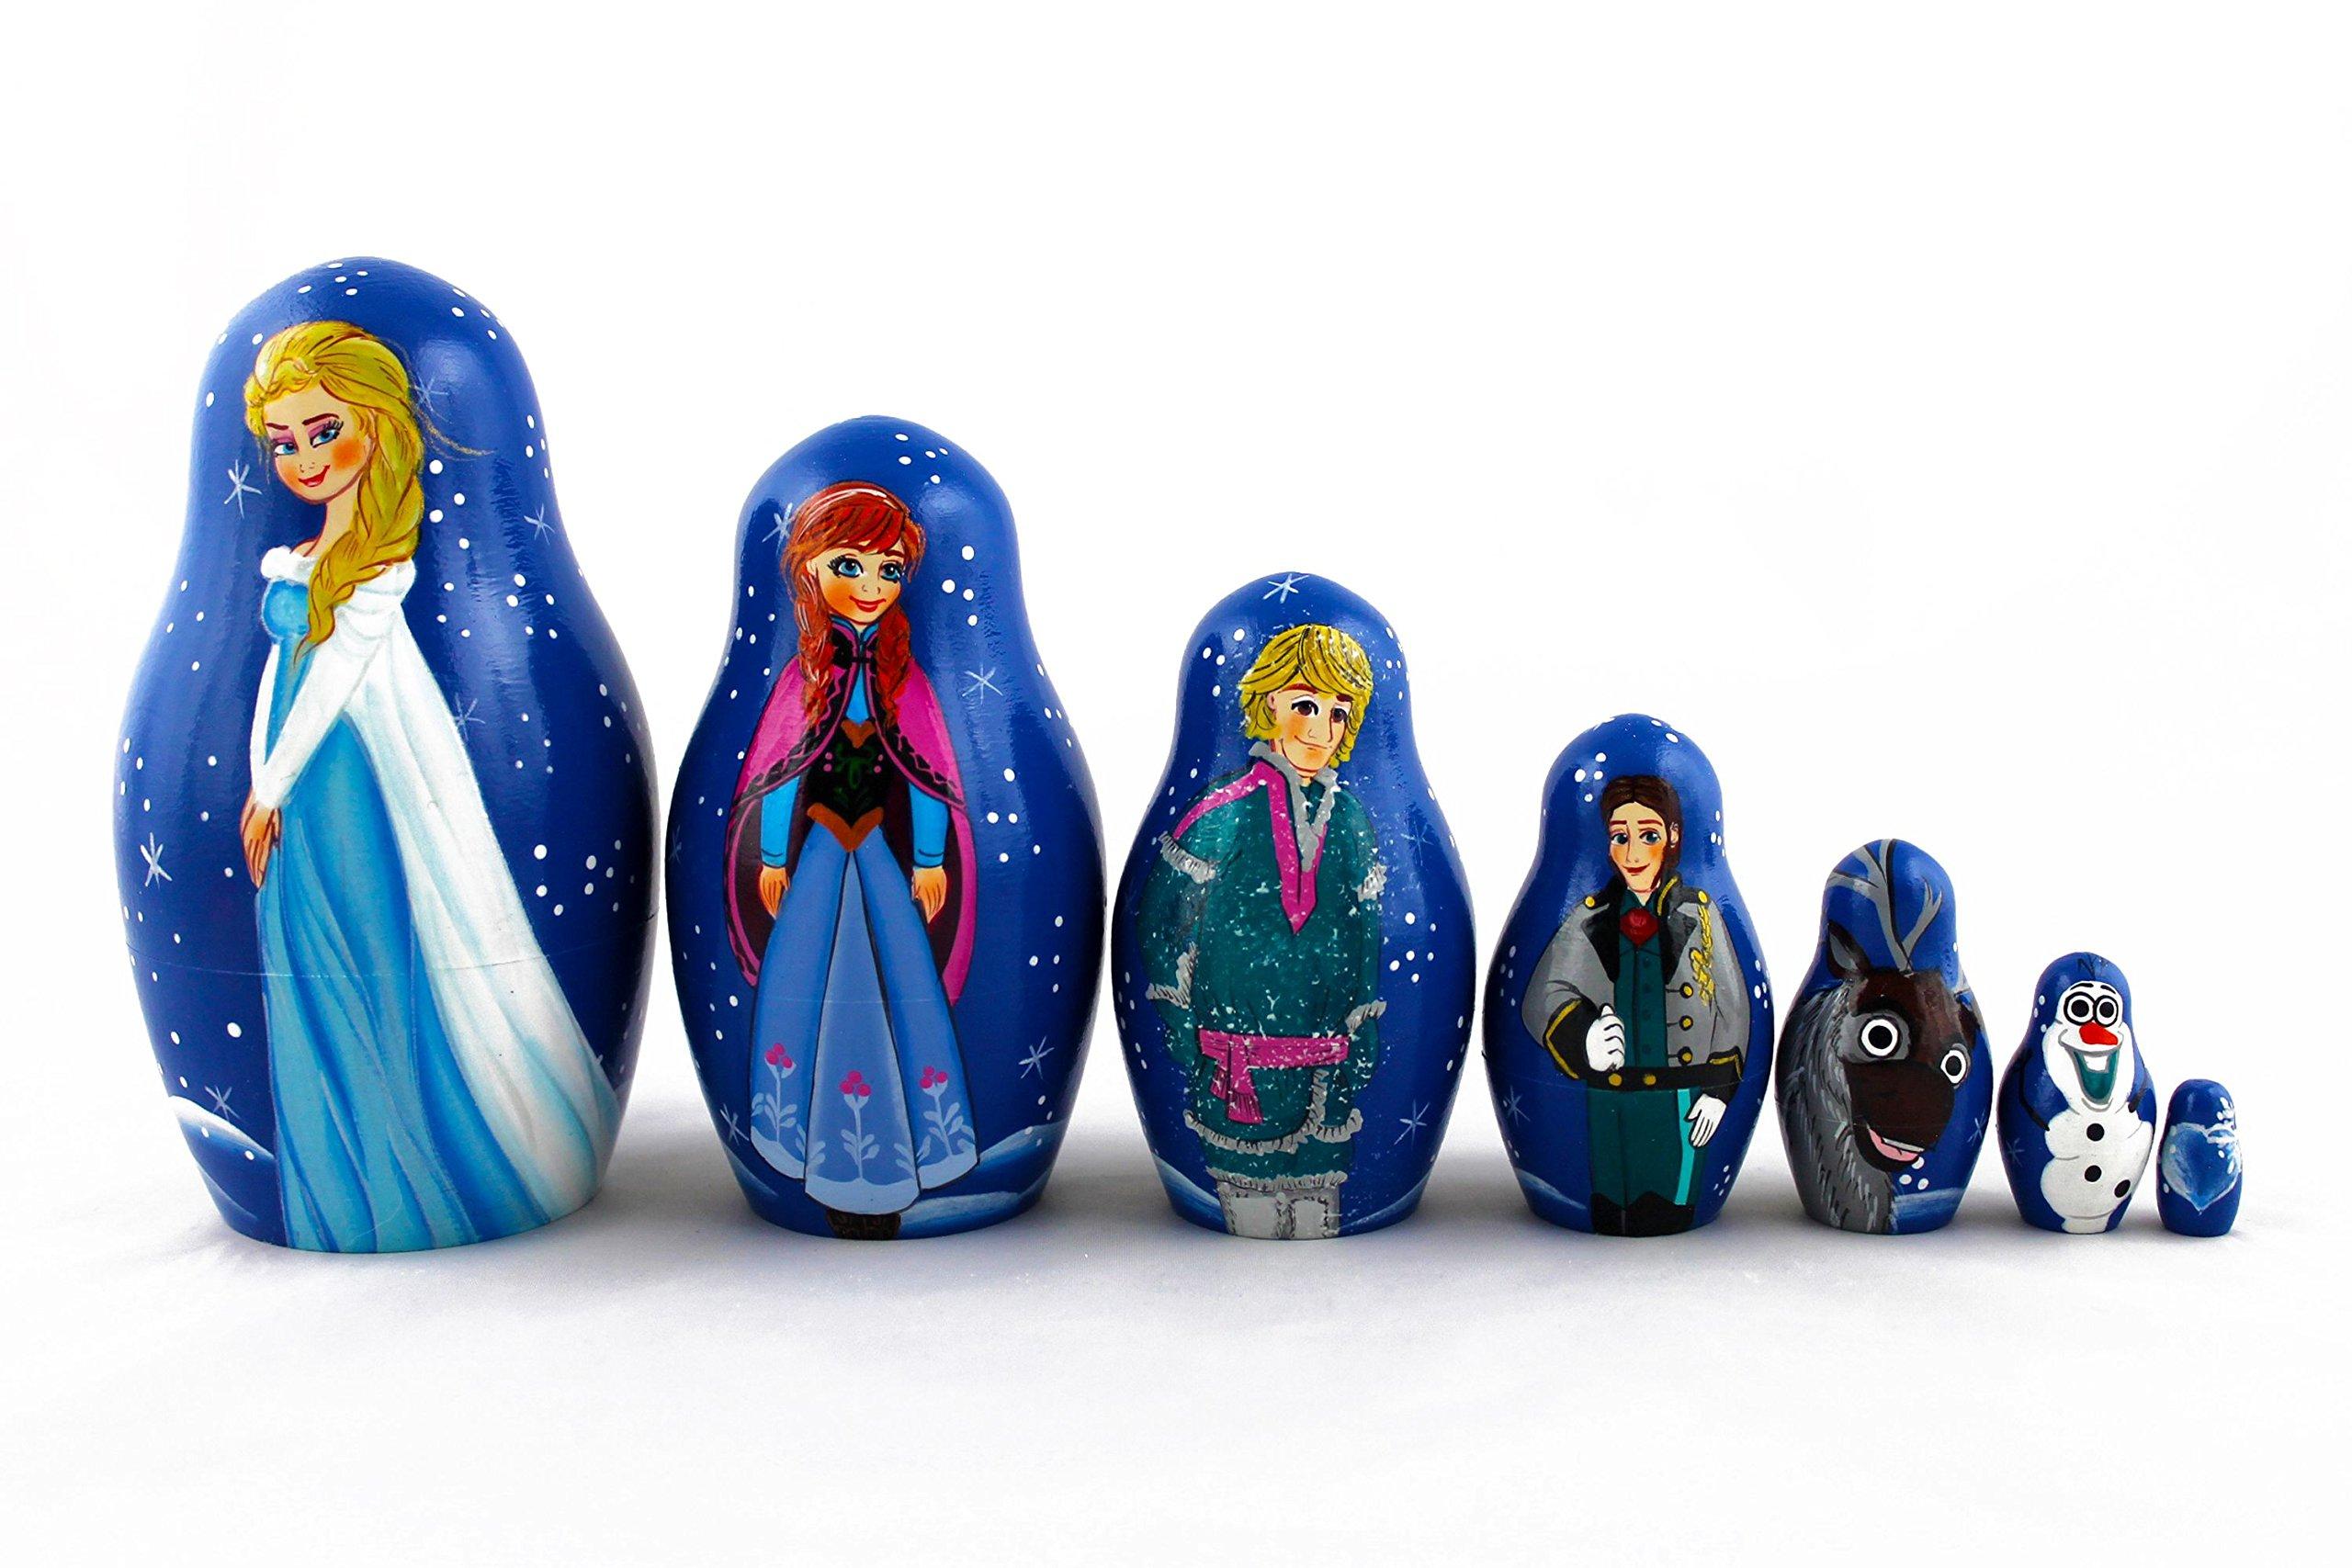 Matryoshka Russian Nesting Doll Babushka Beautiful Cartoon Characters Frozen Elsa Set 7 Pieces Pcs Wooden Hand Painted Souvenir Craft Gift by MATRYOSHKA&HANDICRAFT by MATRYOSHKA&HANDICRAFT